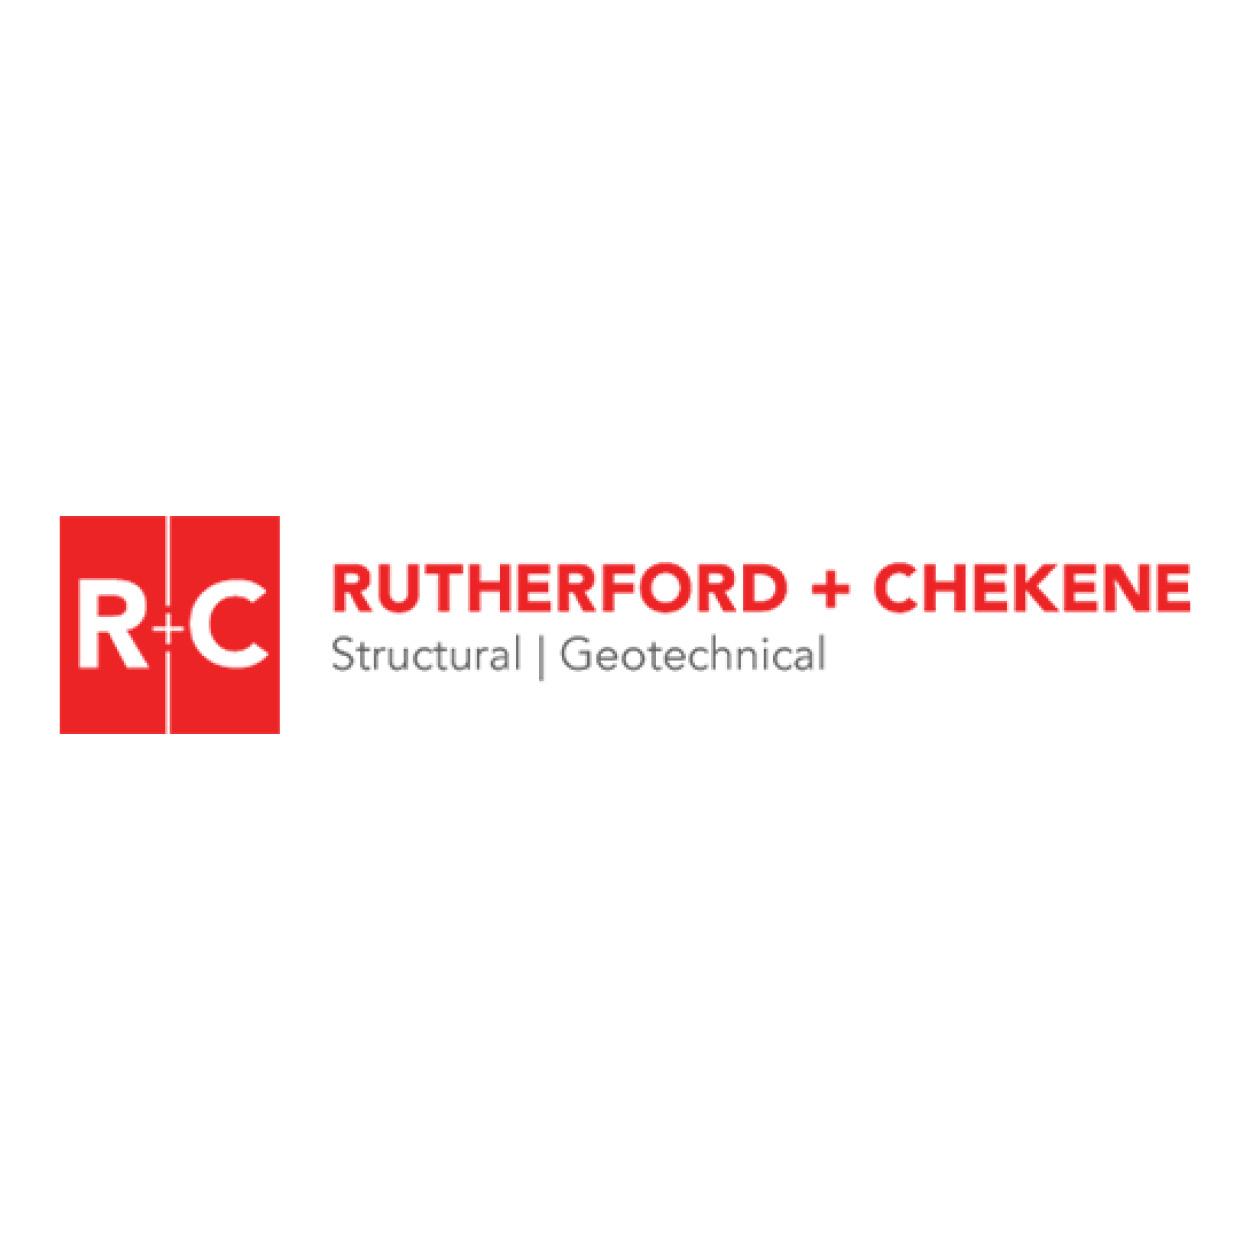 Rutherford & Chekene logo